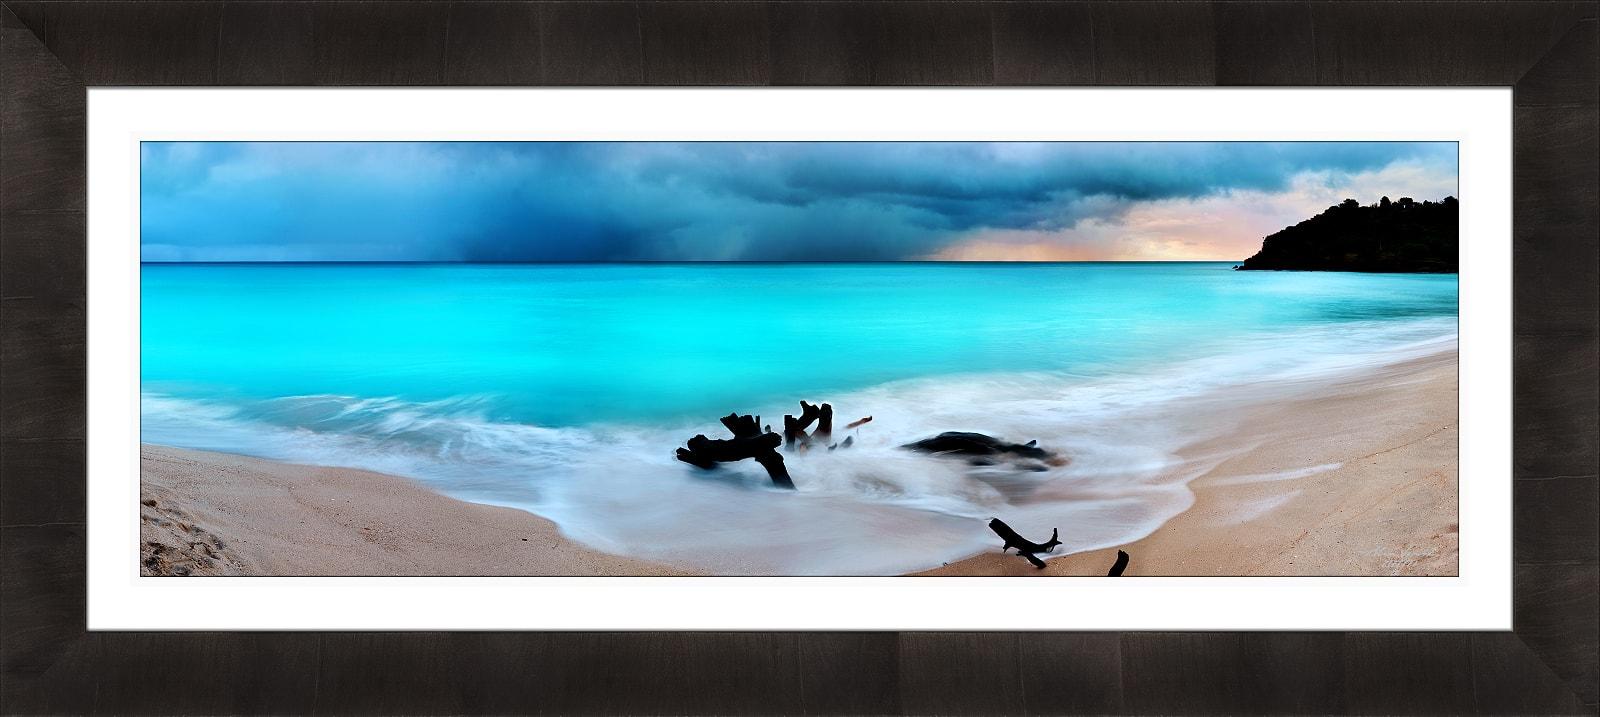 Framed Fine Art Photographic Print